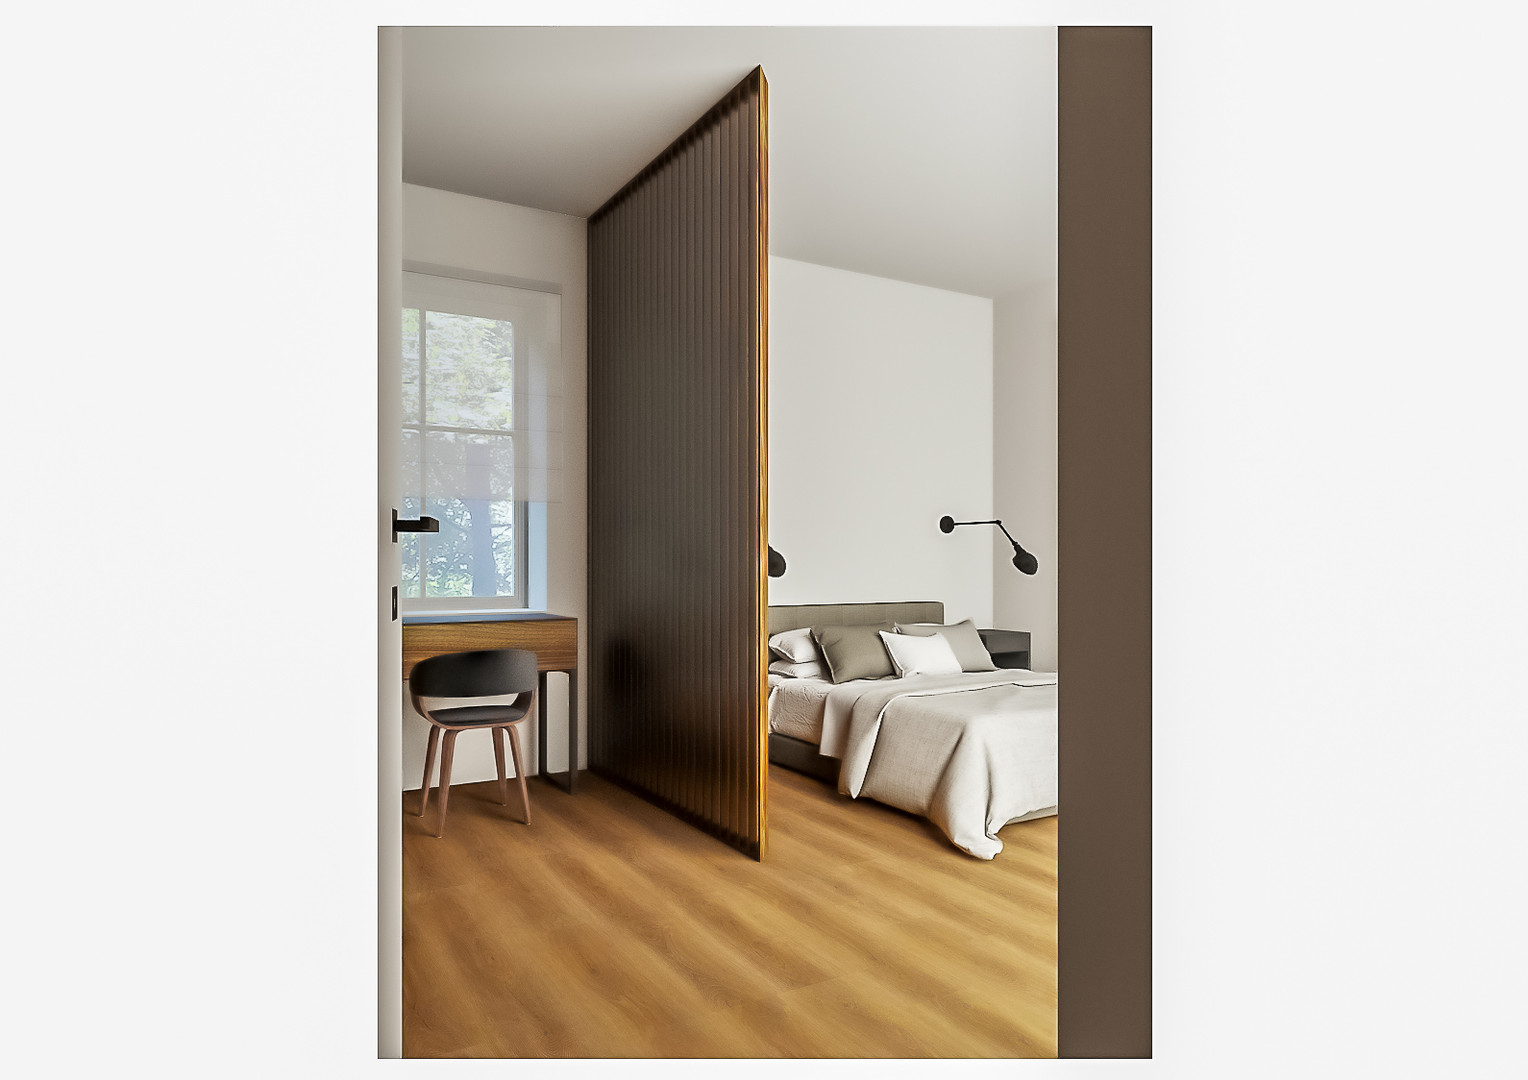 Poznan 3 bedroom for rent-9.jpg